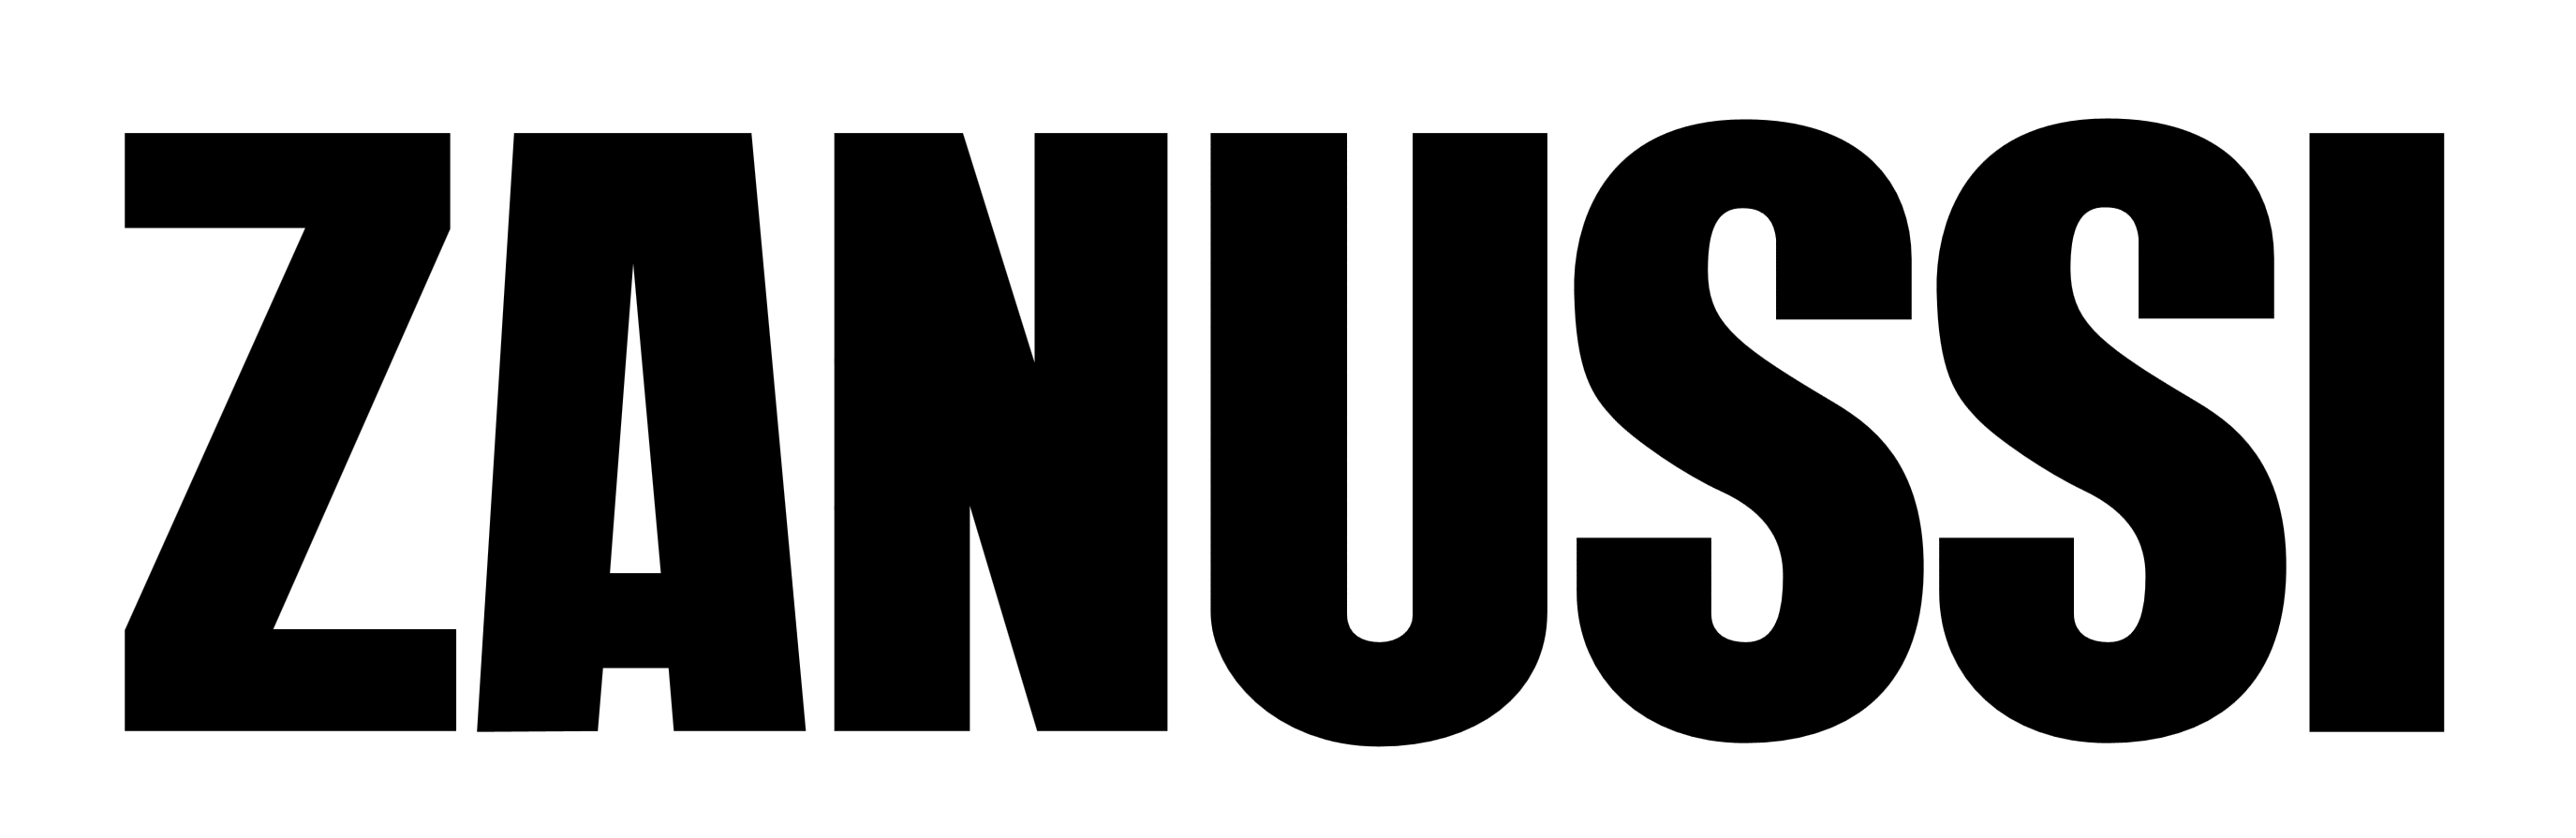 Výsledek obrázku pro ZANUSSI LOGO